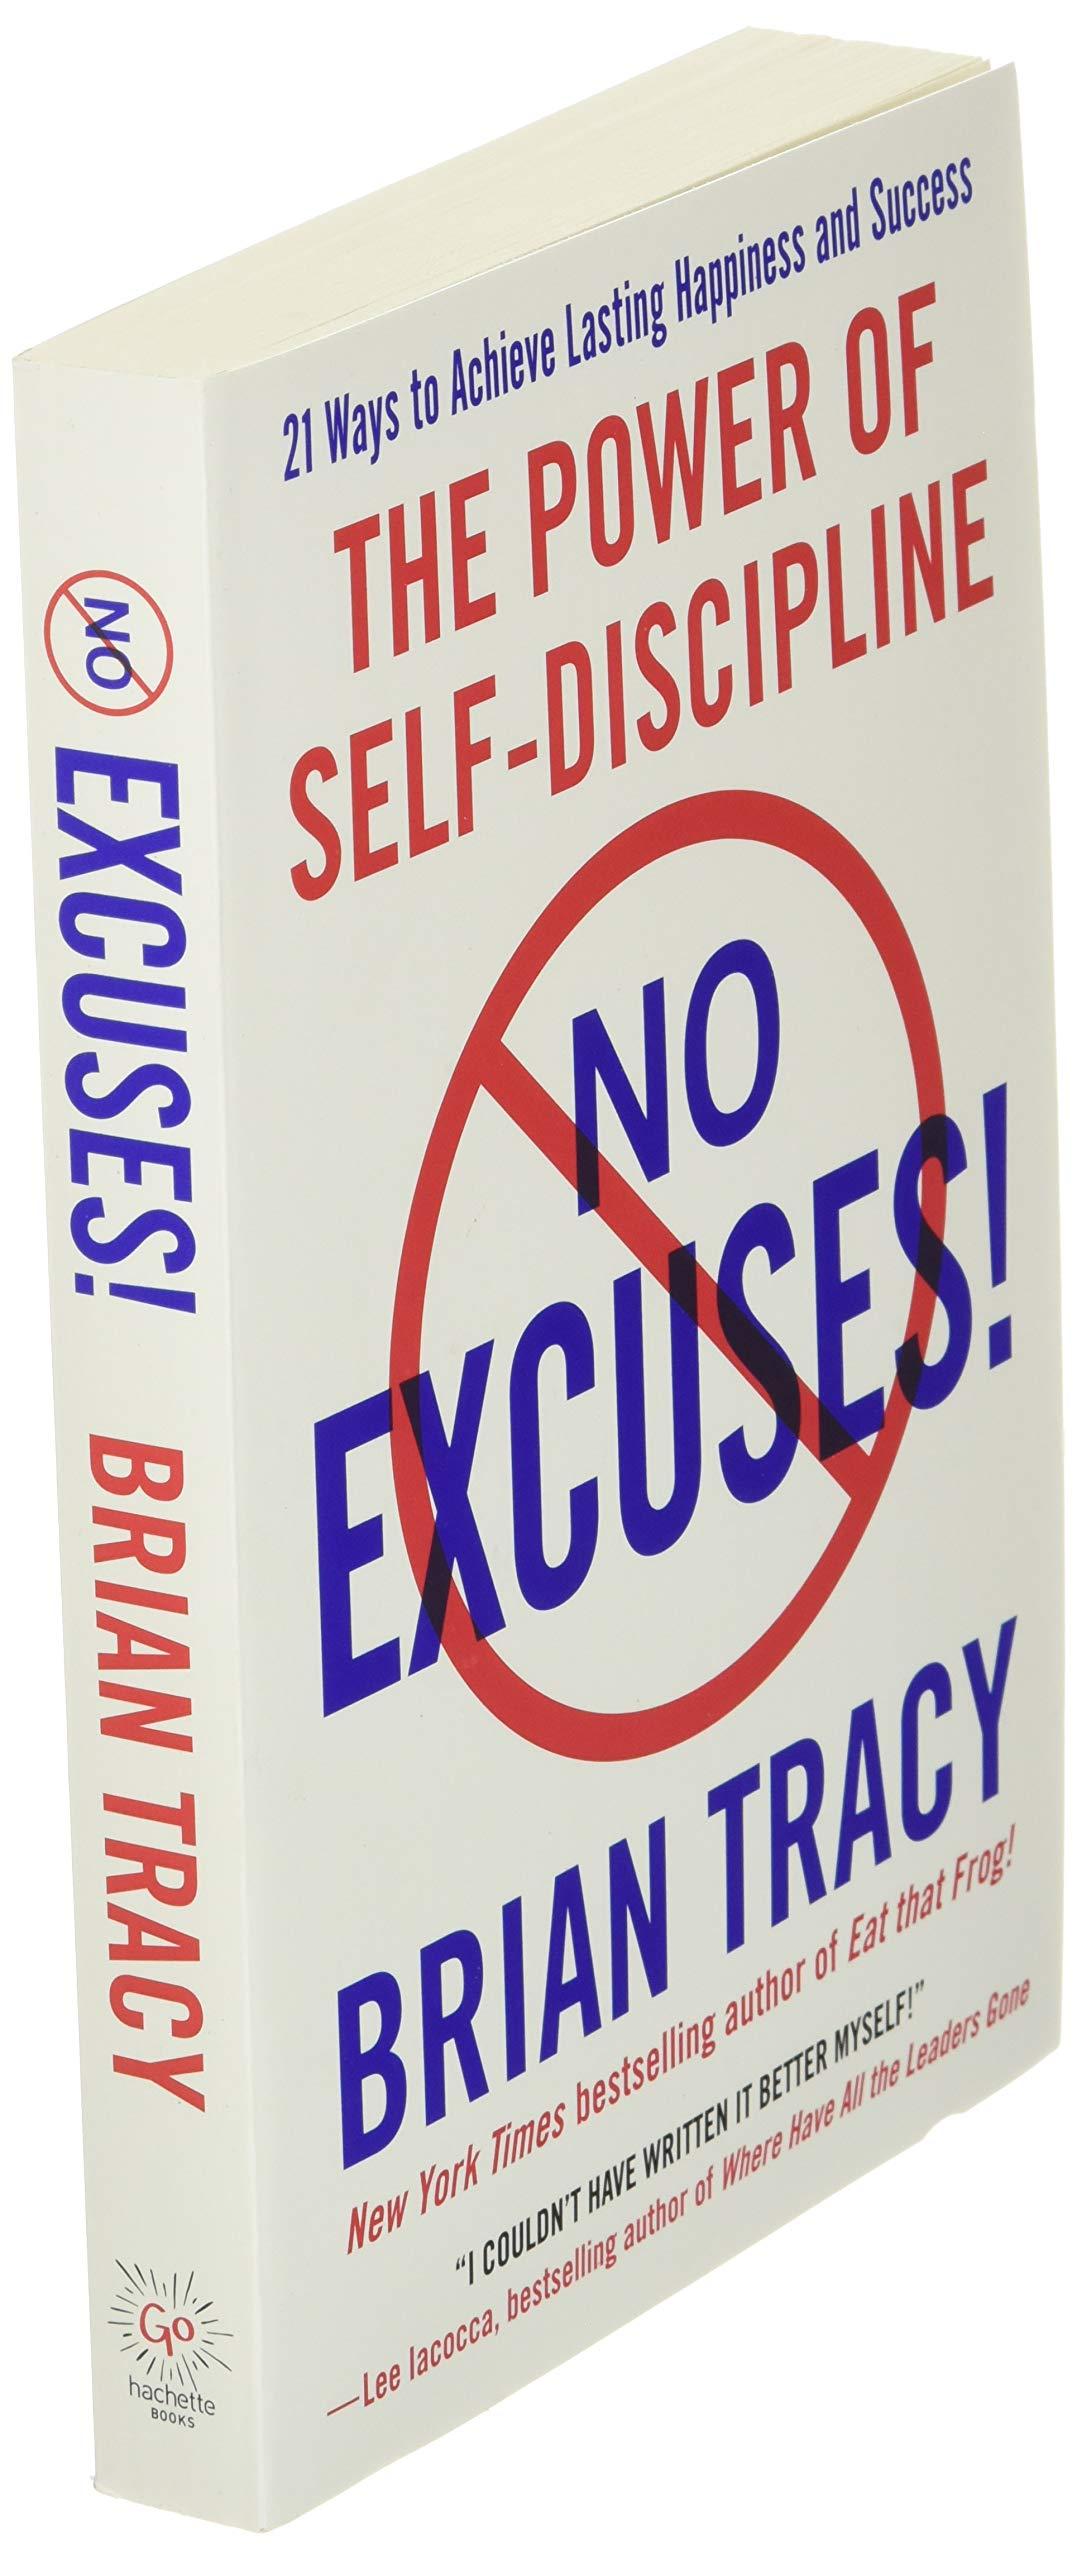 No Excuses!: The Power of Self-Discipline: Tracy, Brian: 9782133487521:  Amazon.com: Books